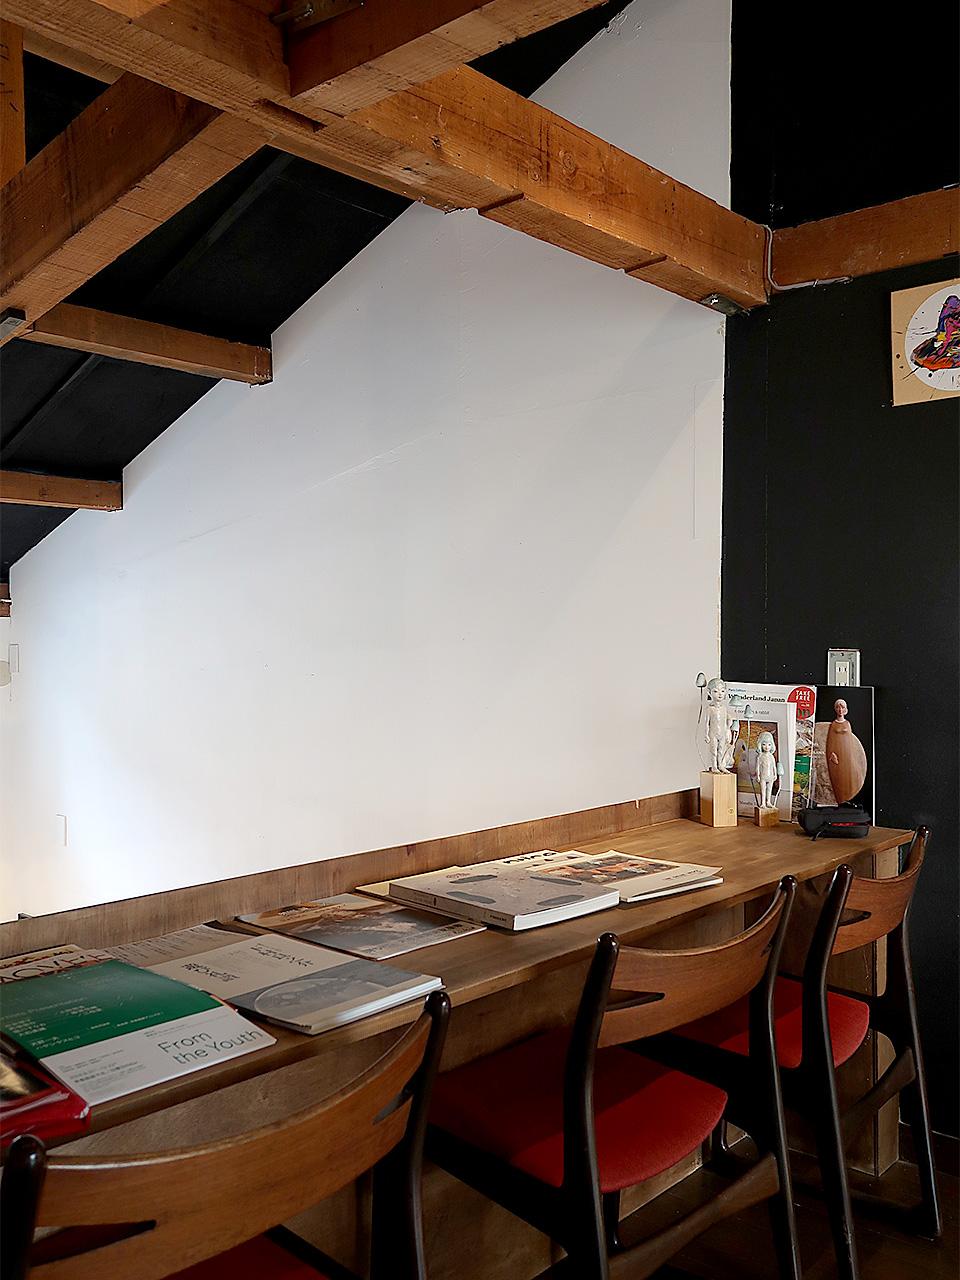 芦屋画廊kyoto 2F